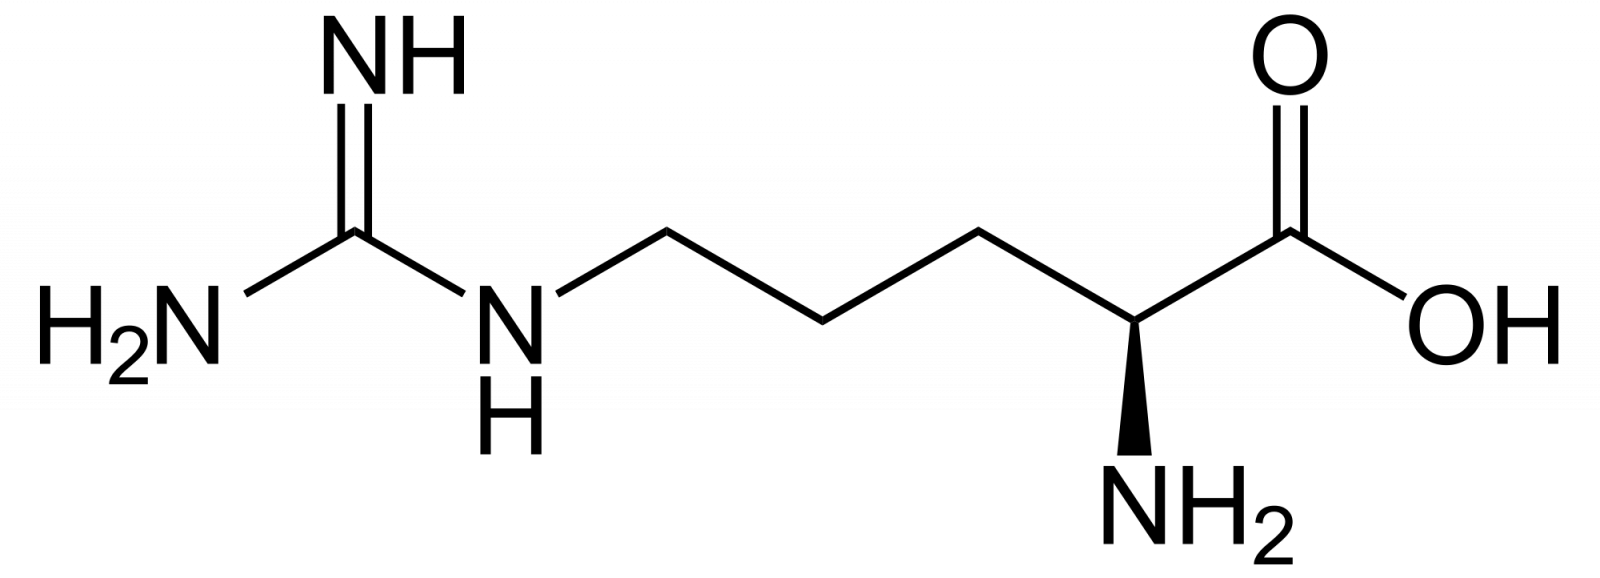 О действии цитруллина при дефиците белка